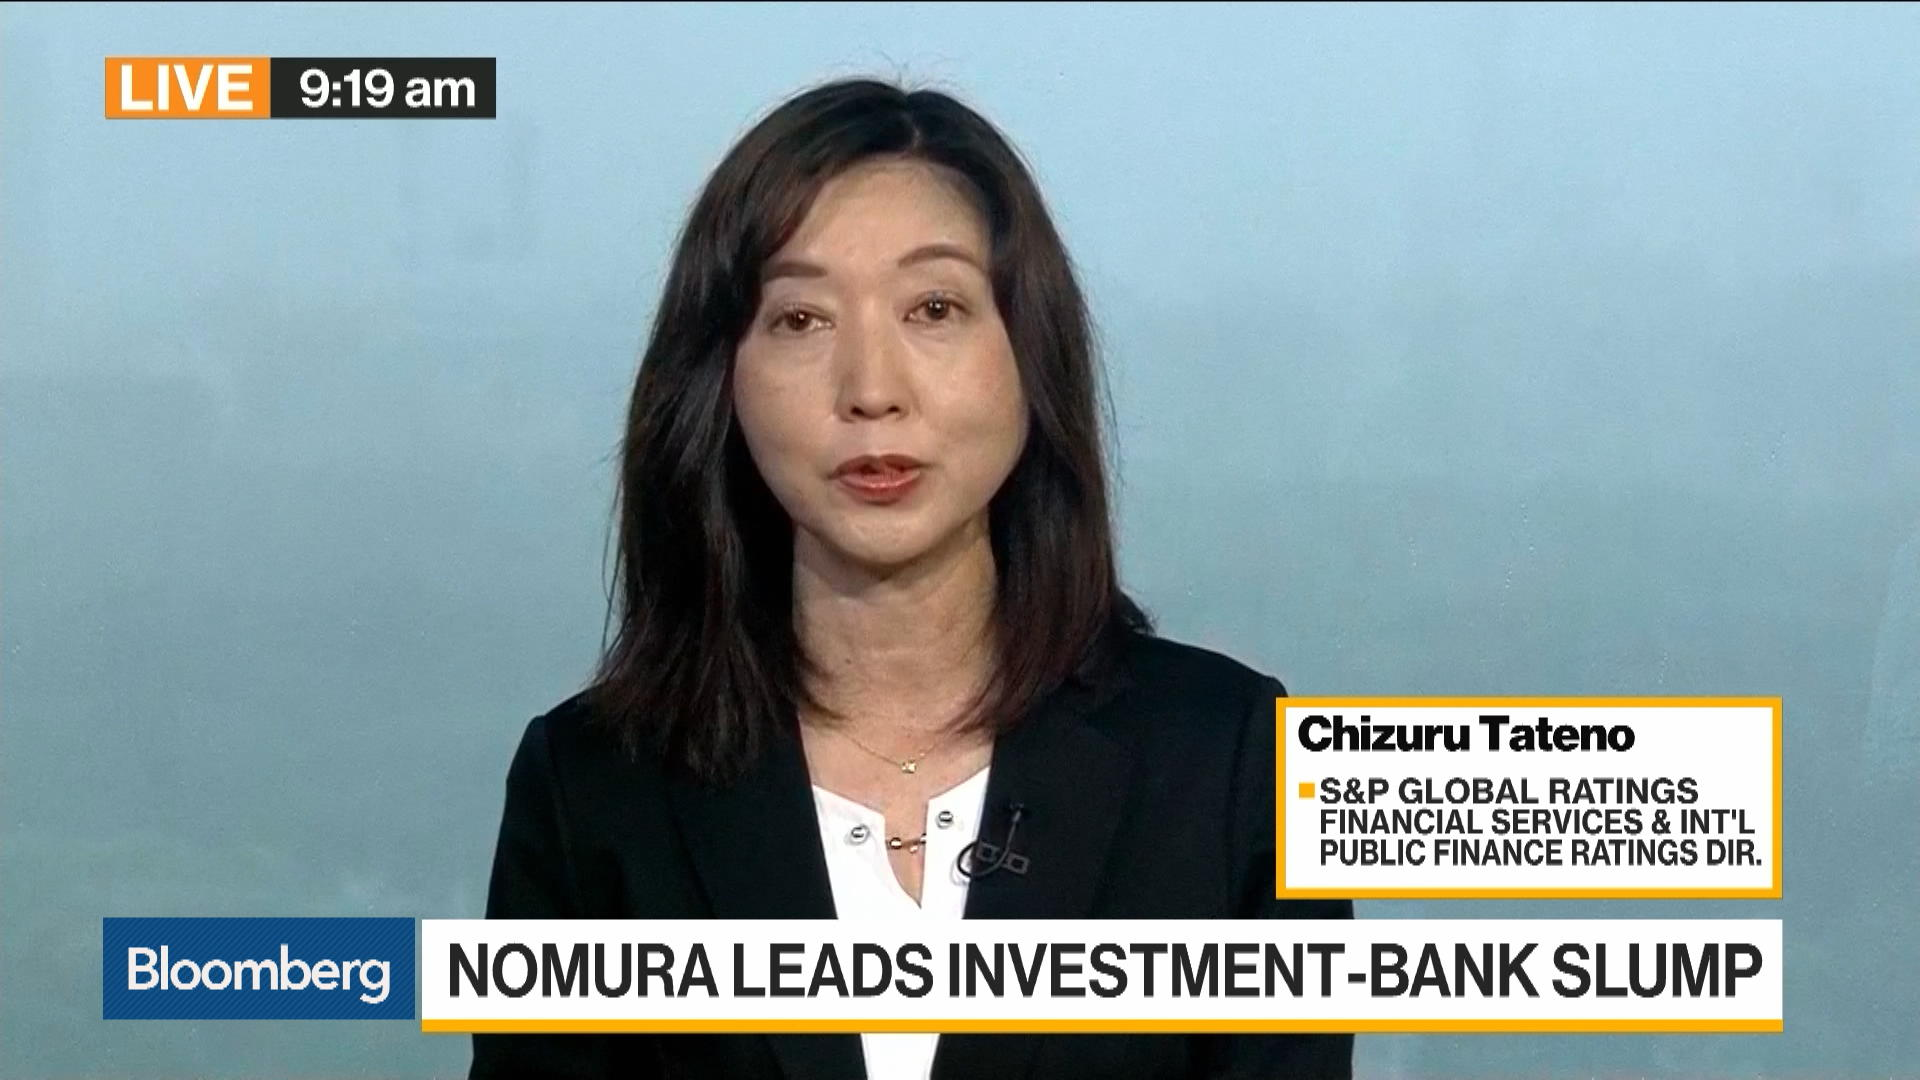 Will Nomura's Turnaround Plan Succeed?